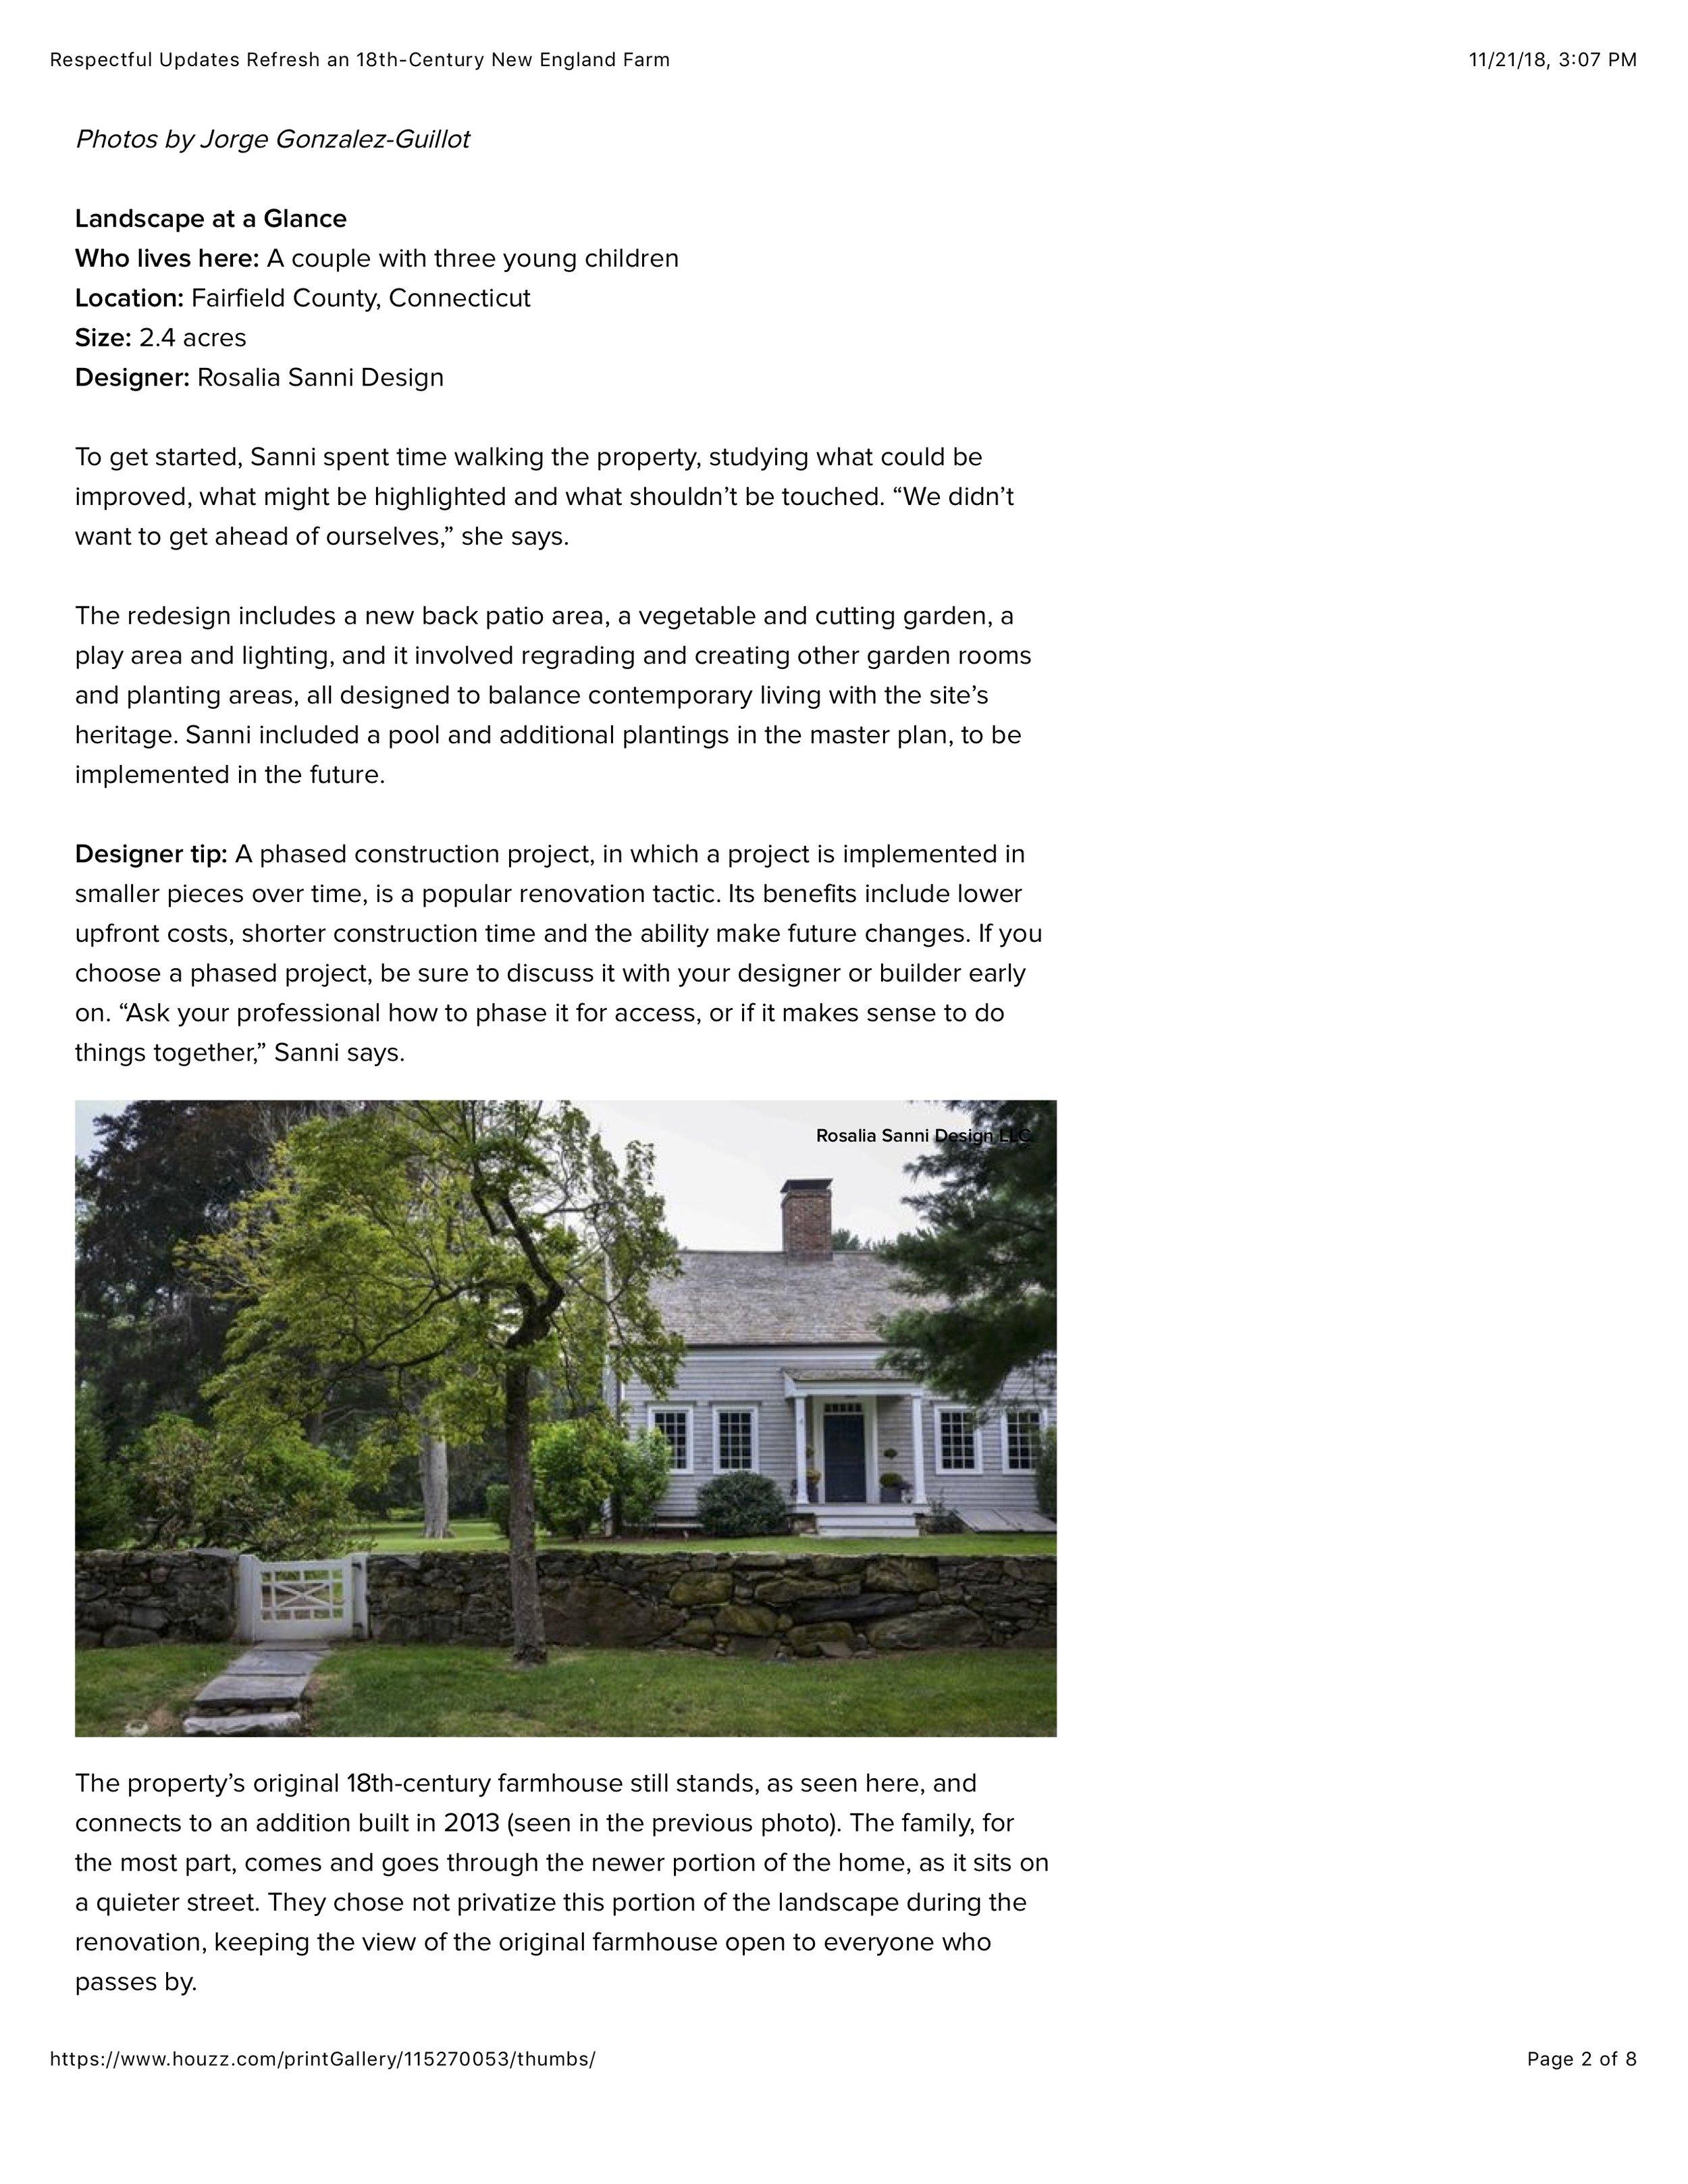 Respectful Updates Refresh an 18th-Century New England Farm 2.jpg